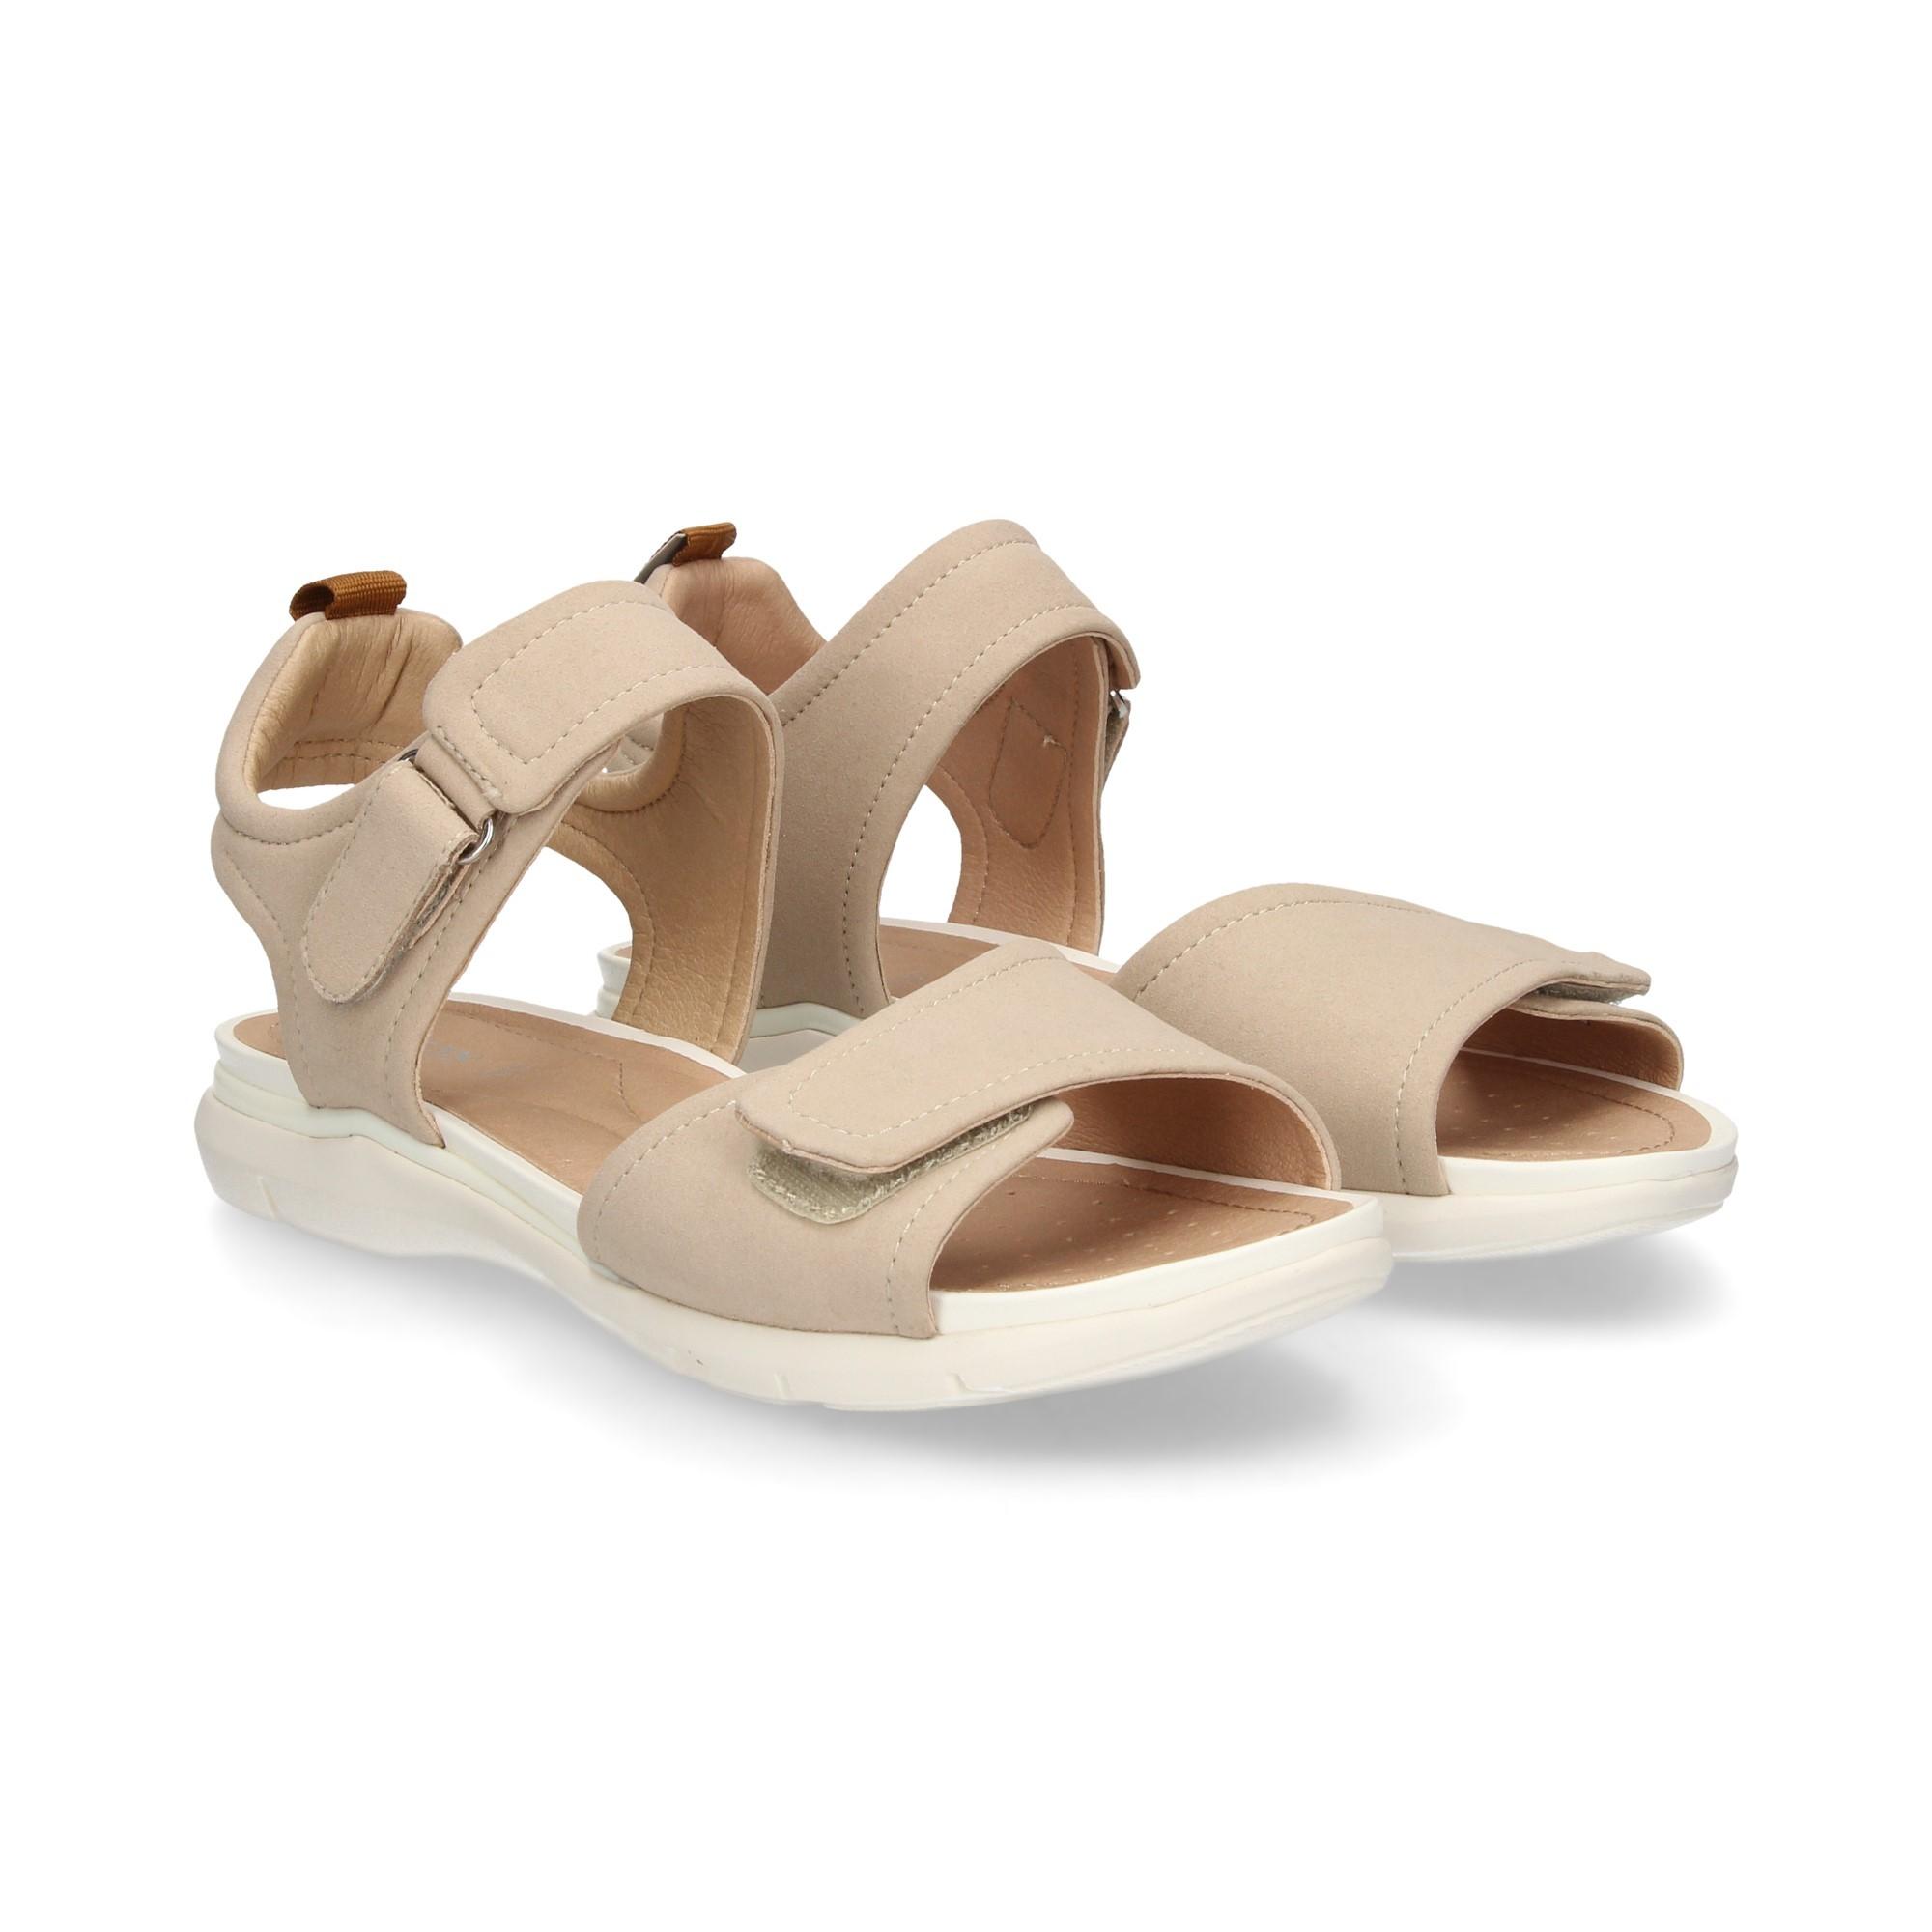 sells best sell brand new GEOX Women's Flat sandals D92F1A C5000 BEIGE